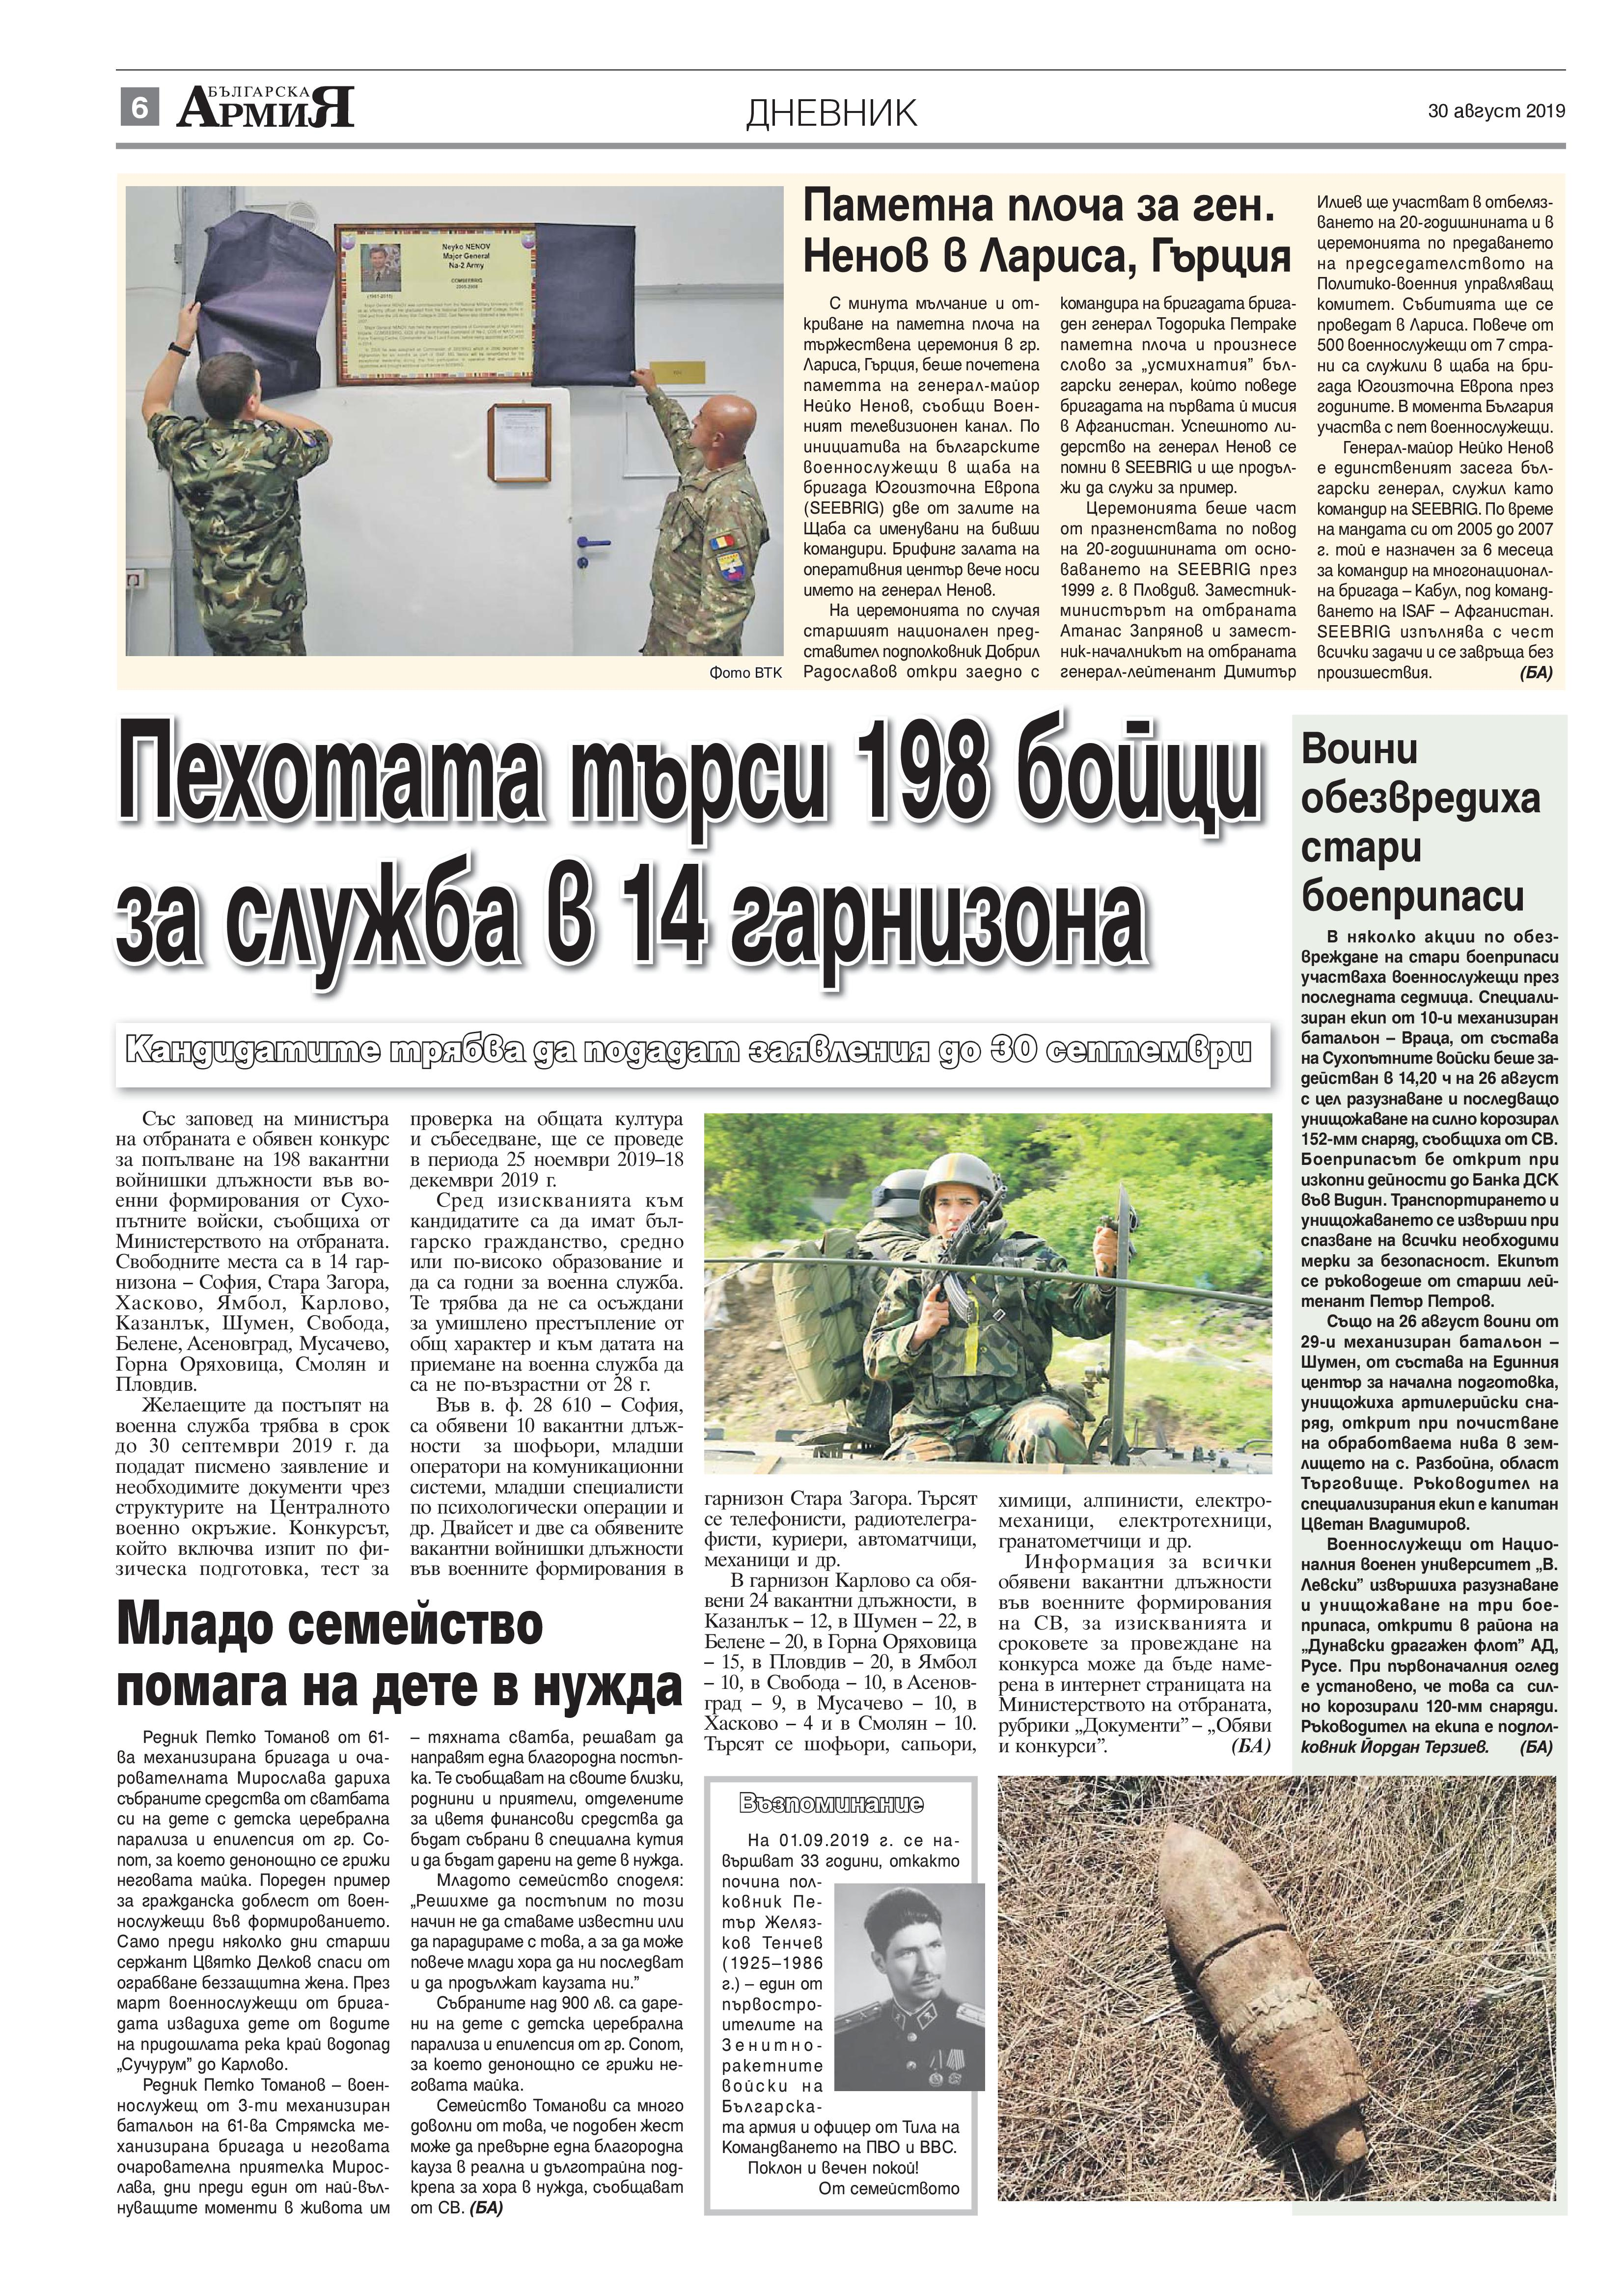 https://armymedia.bg/wp-content/uploads/2015/06/06-30.jpg